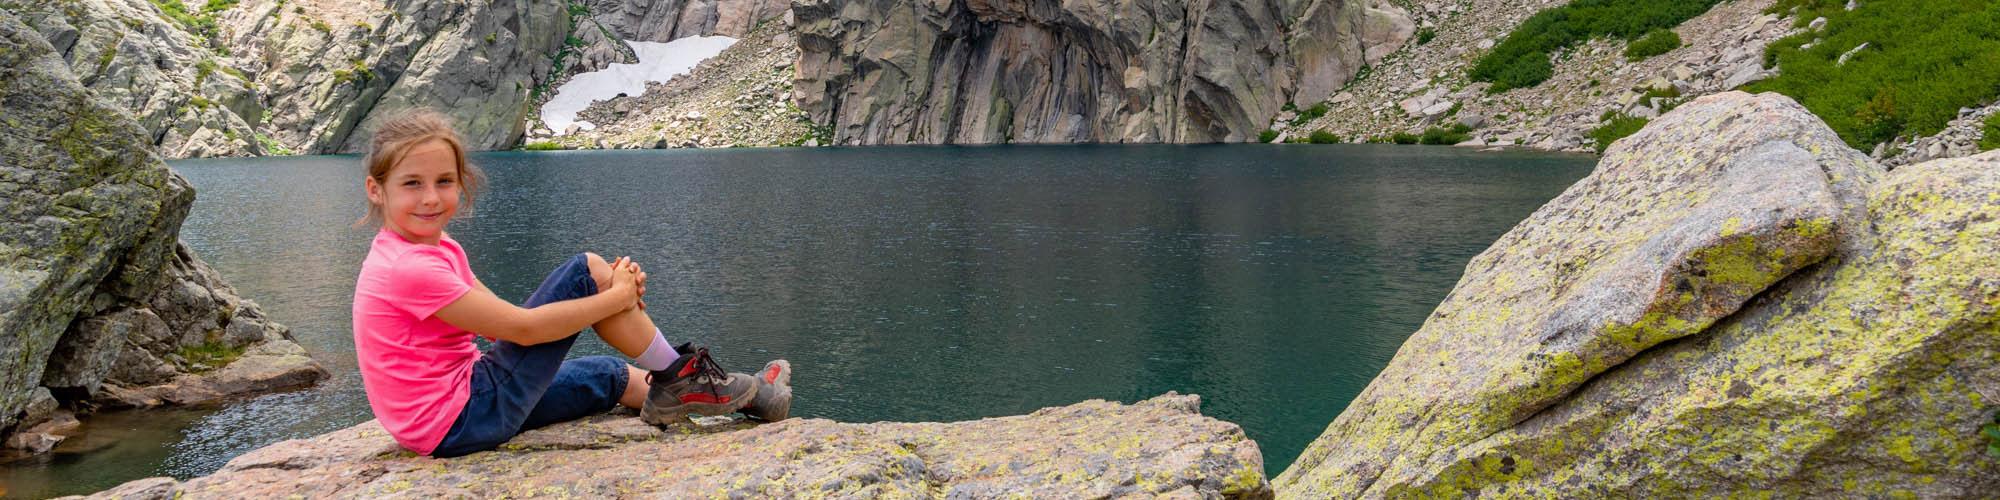 Randonnée en Corse - Lac de Capitello